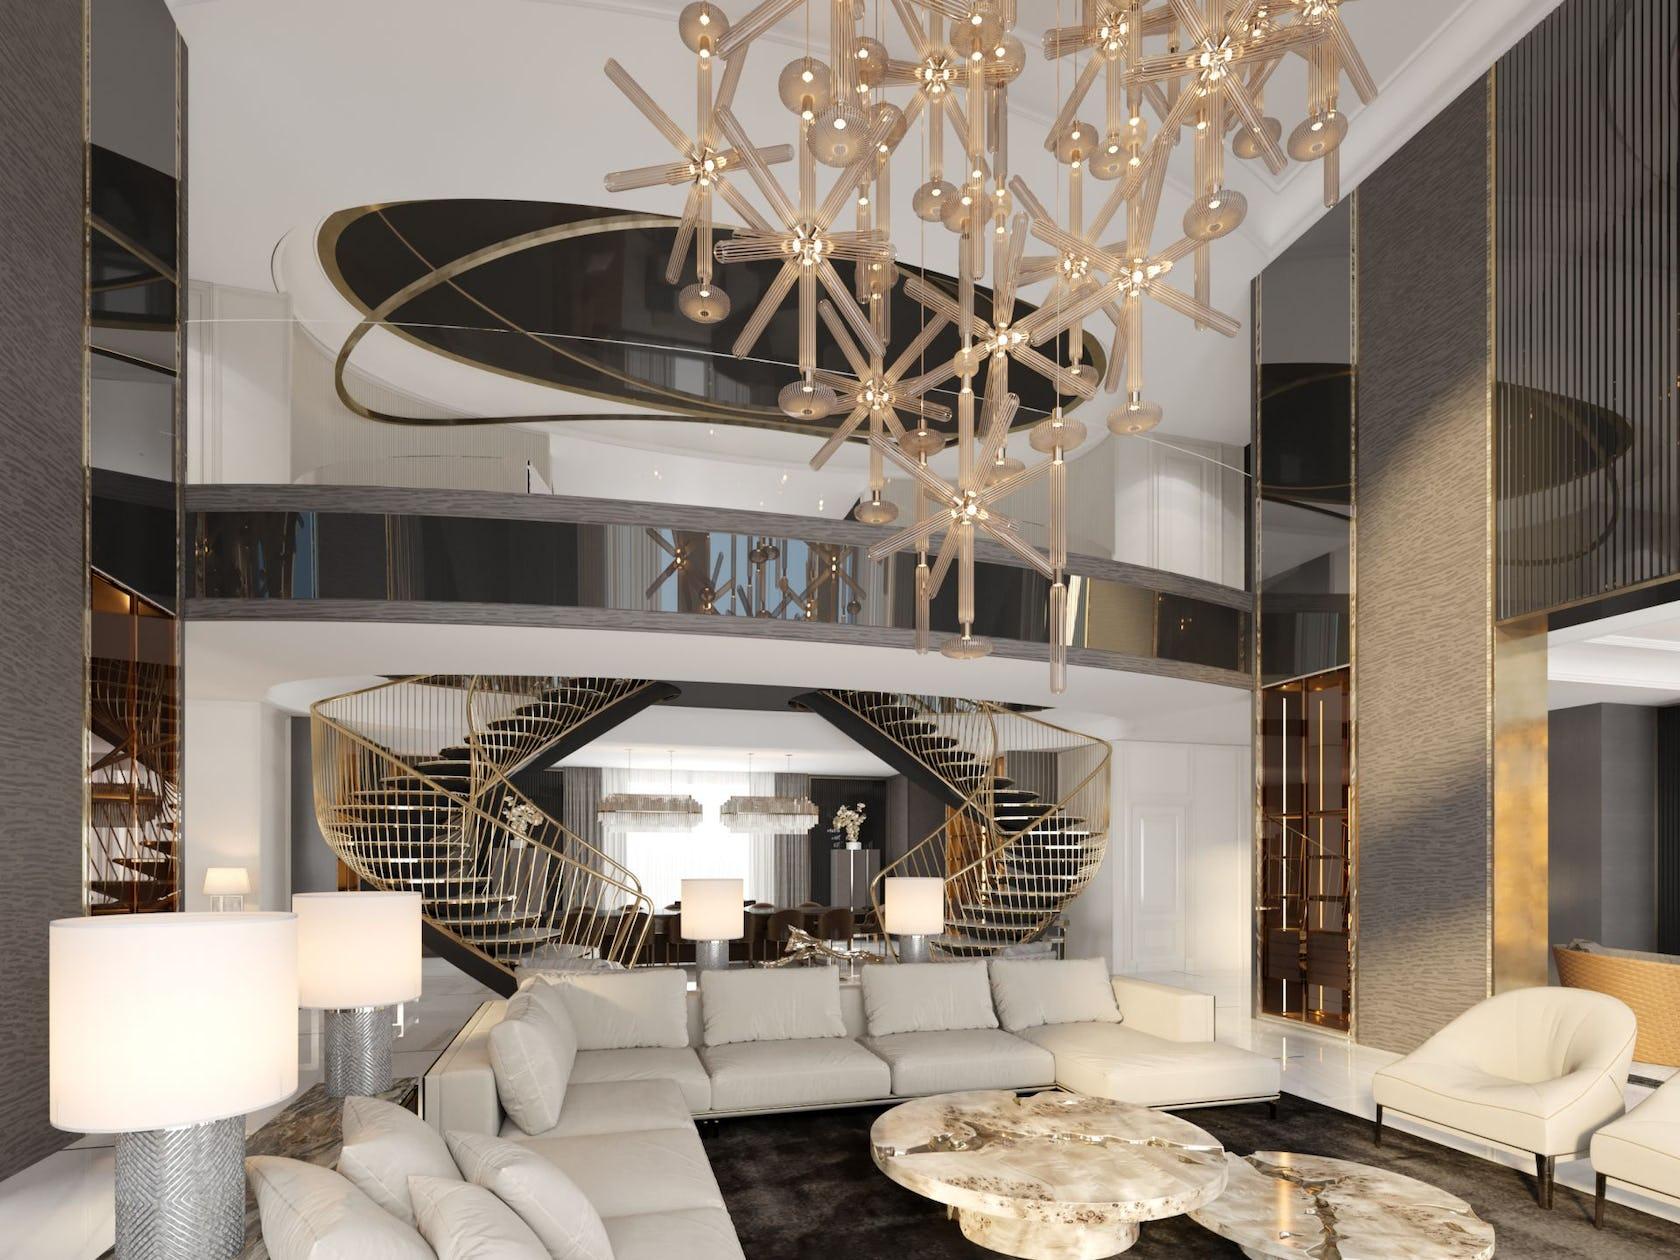 housing building living room indoors room interior design loft chandelier lamp